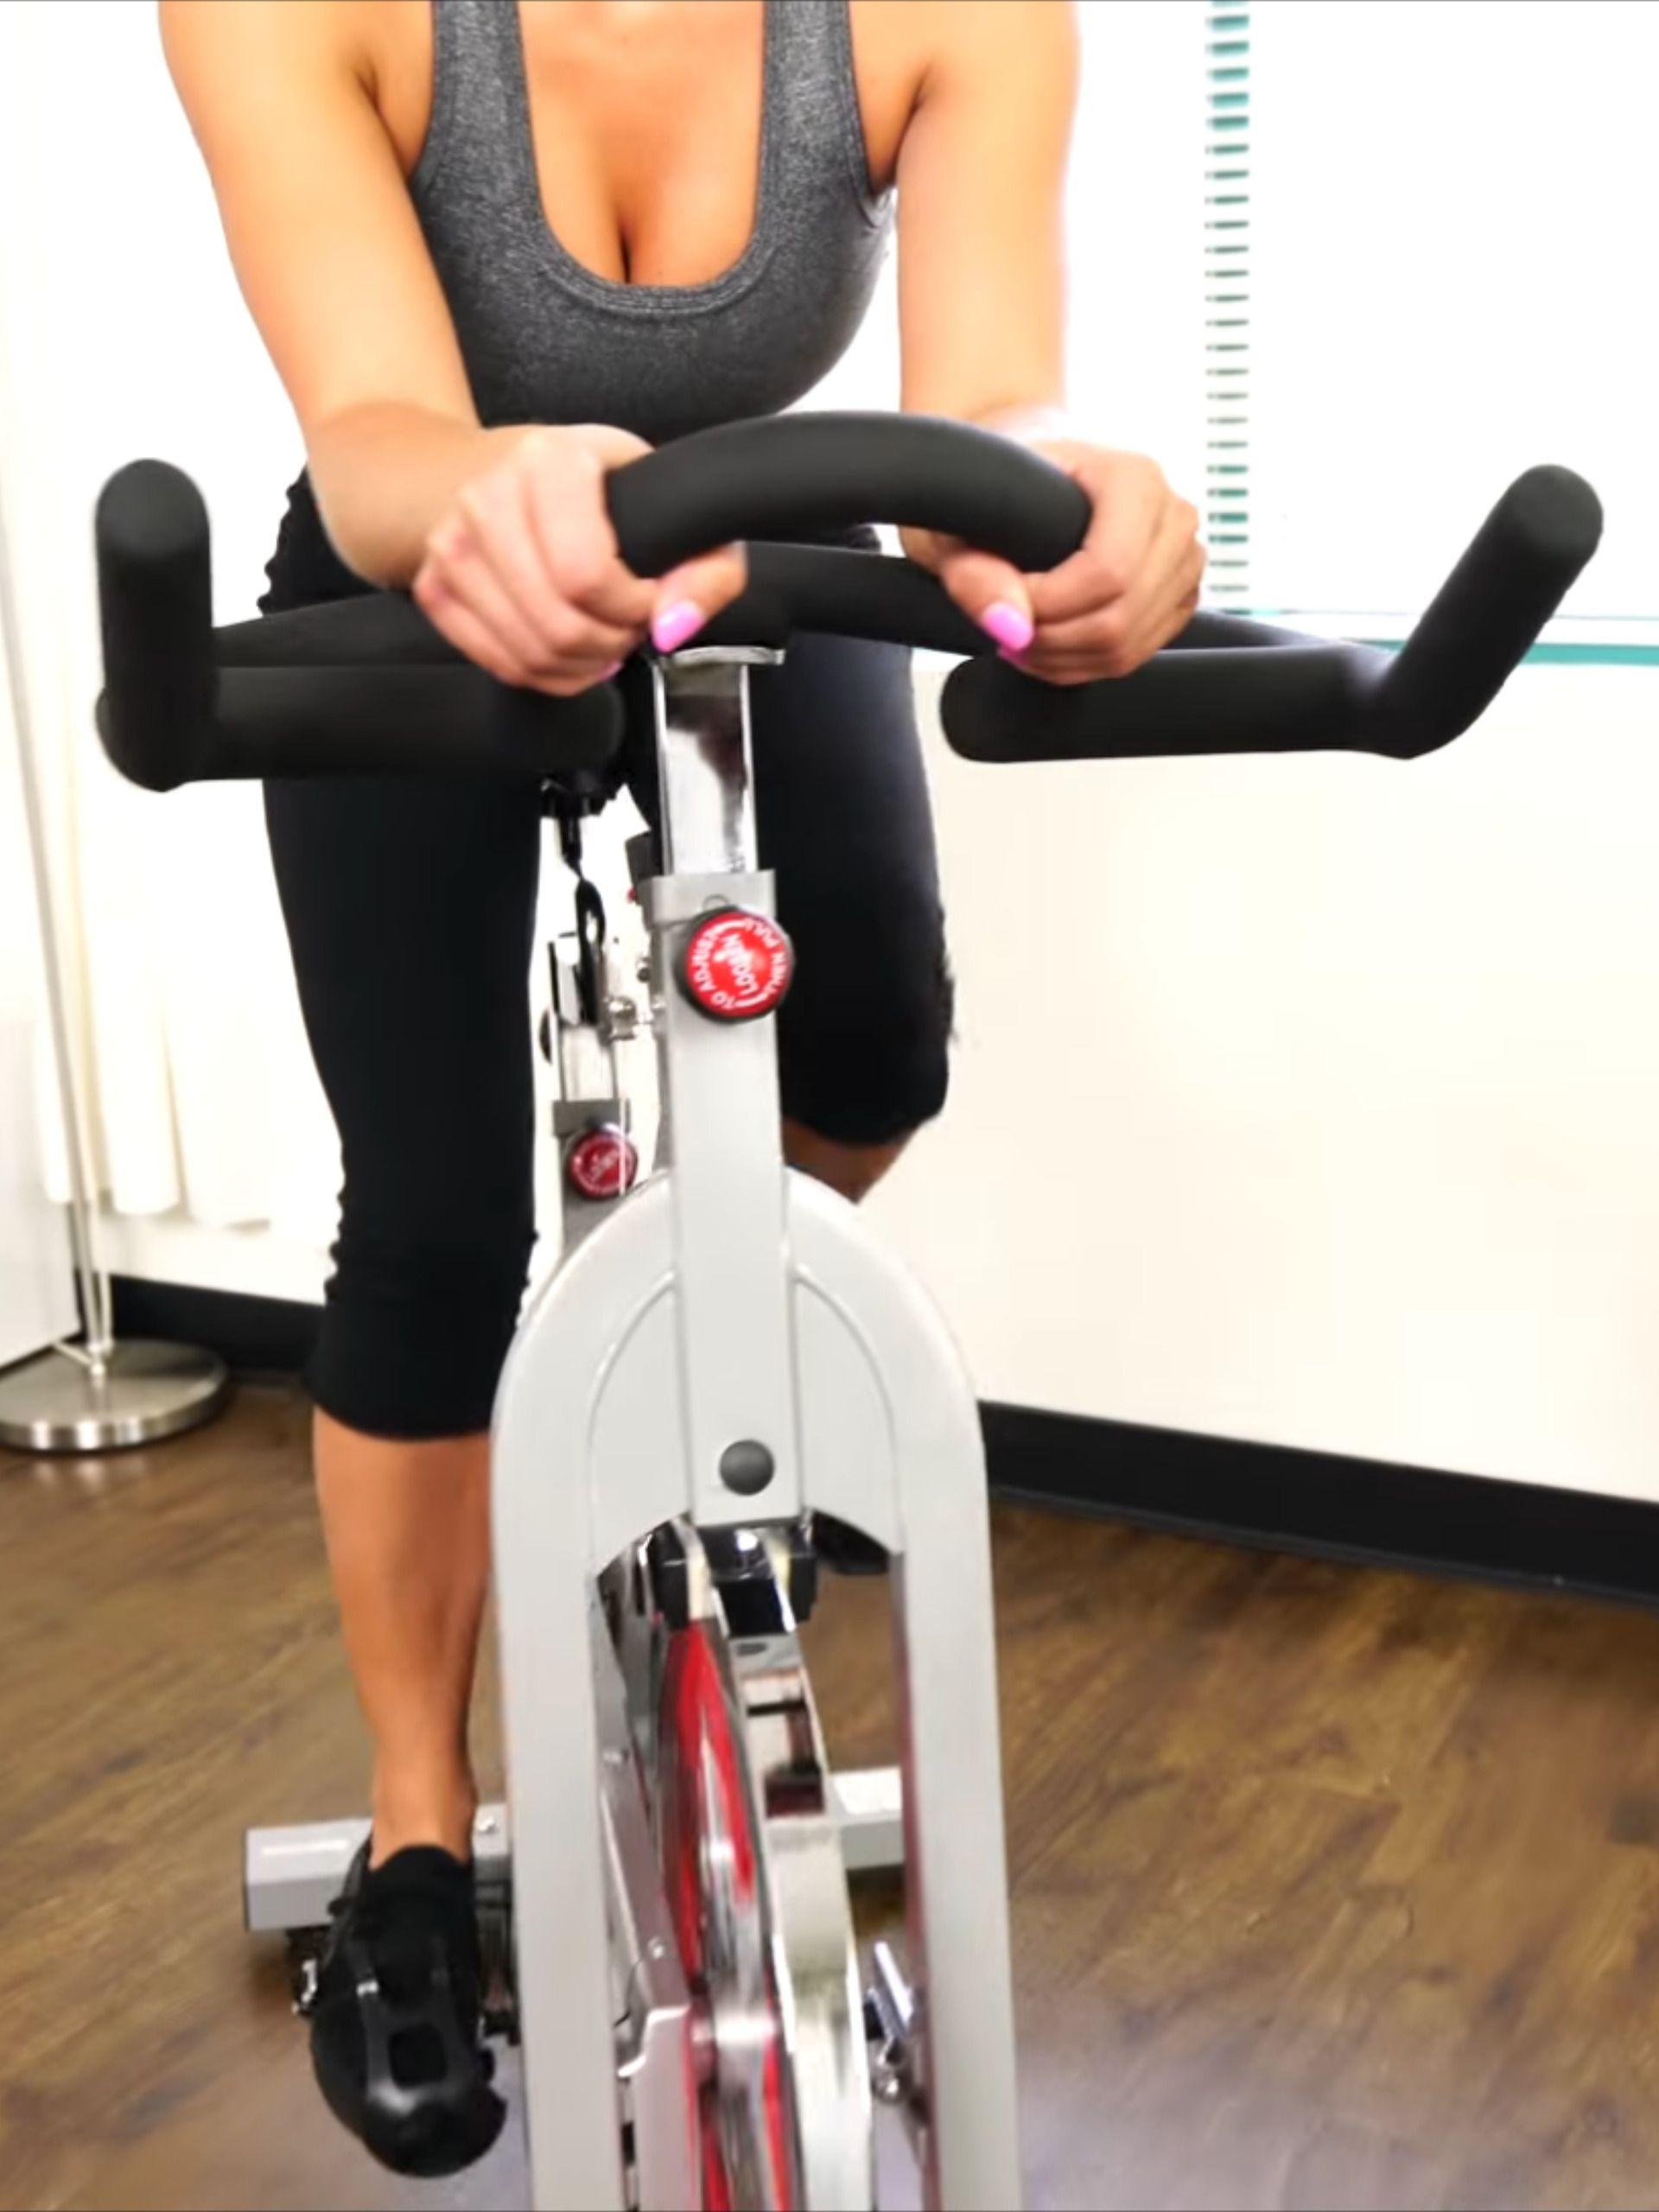 Best Exercise Bike Under 300 Mini Exercise Bike Walmart Pro